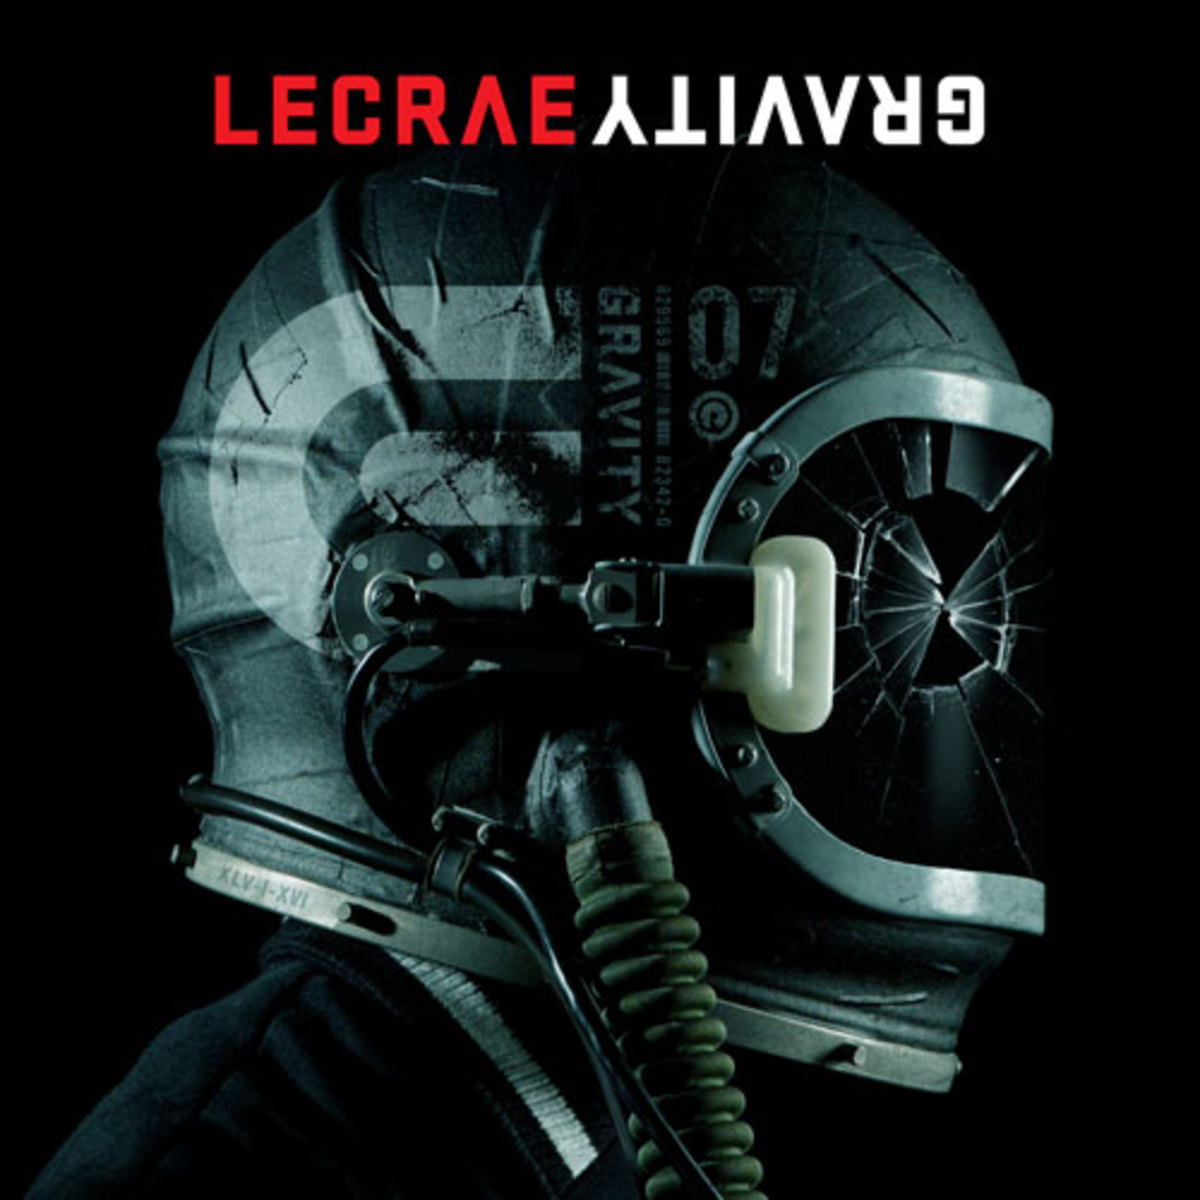 lecrae-gravity.jpg